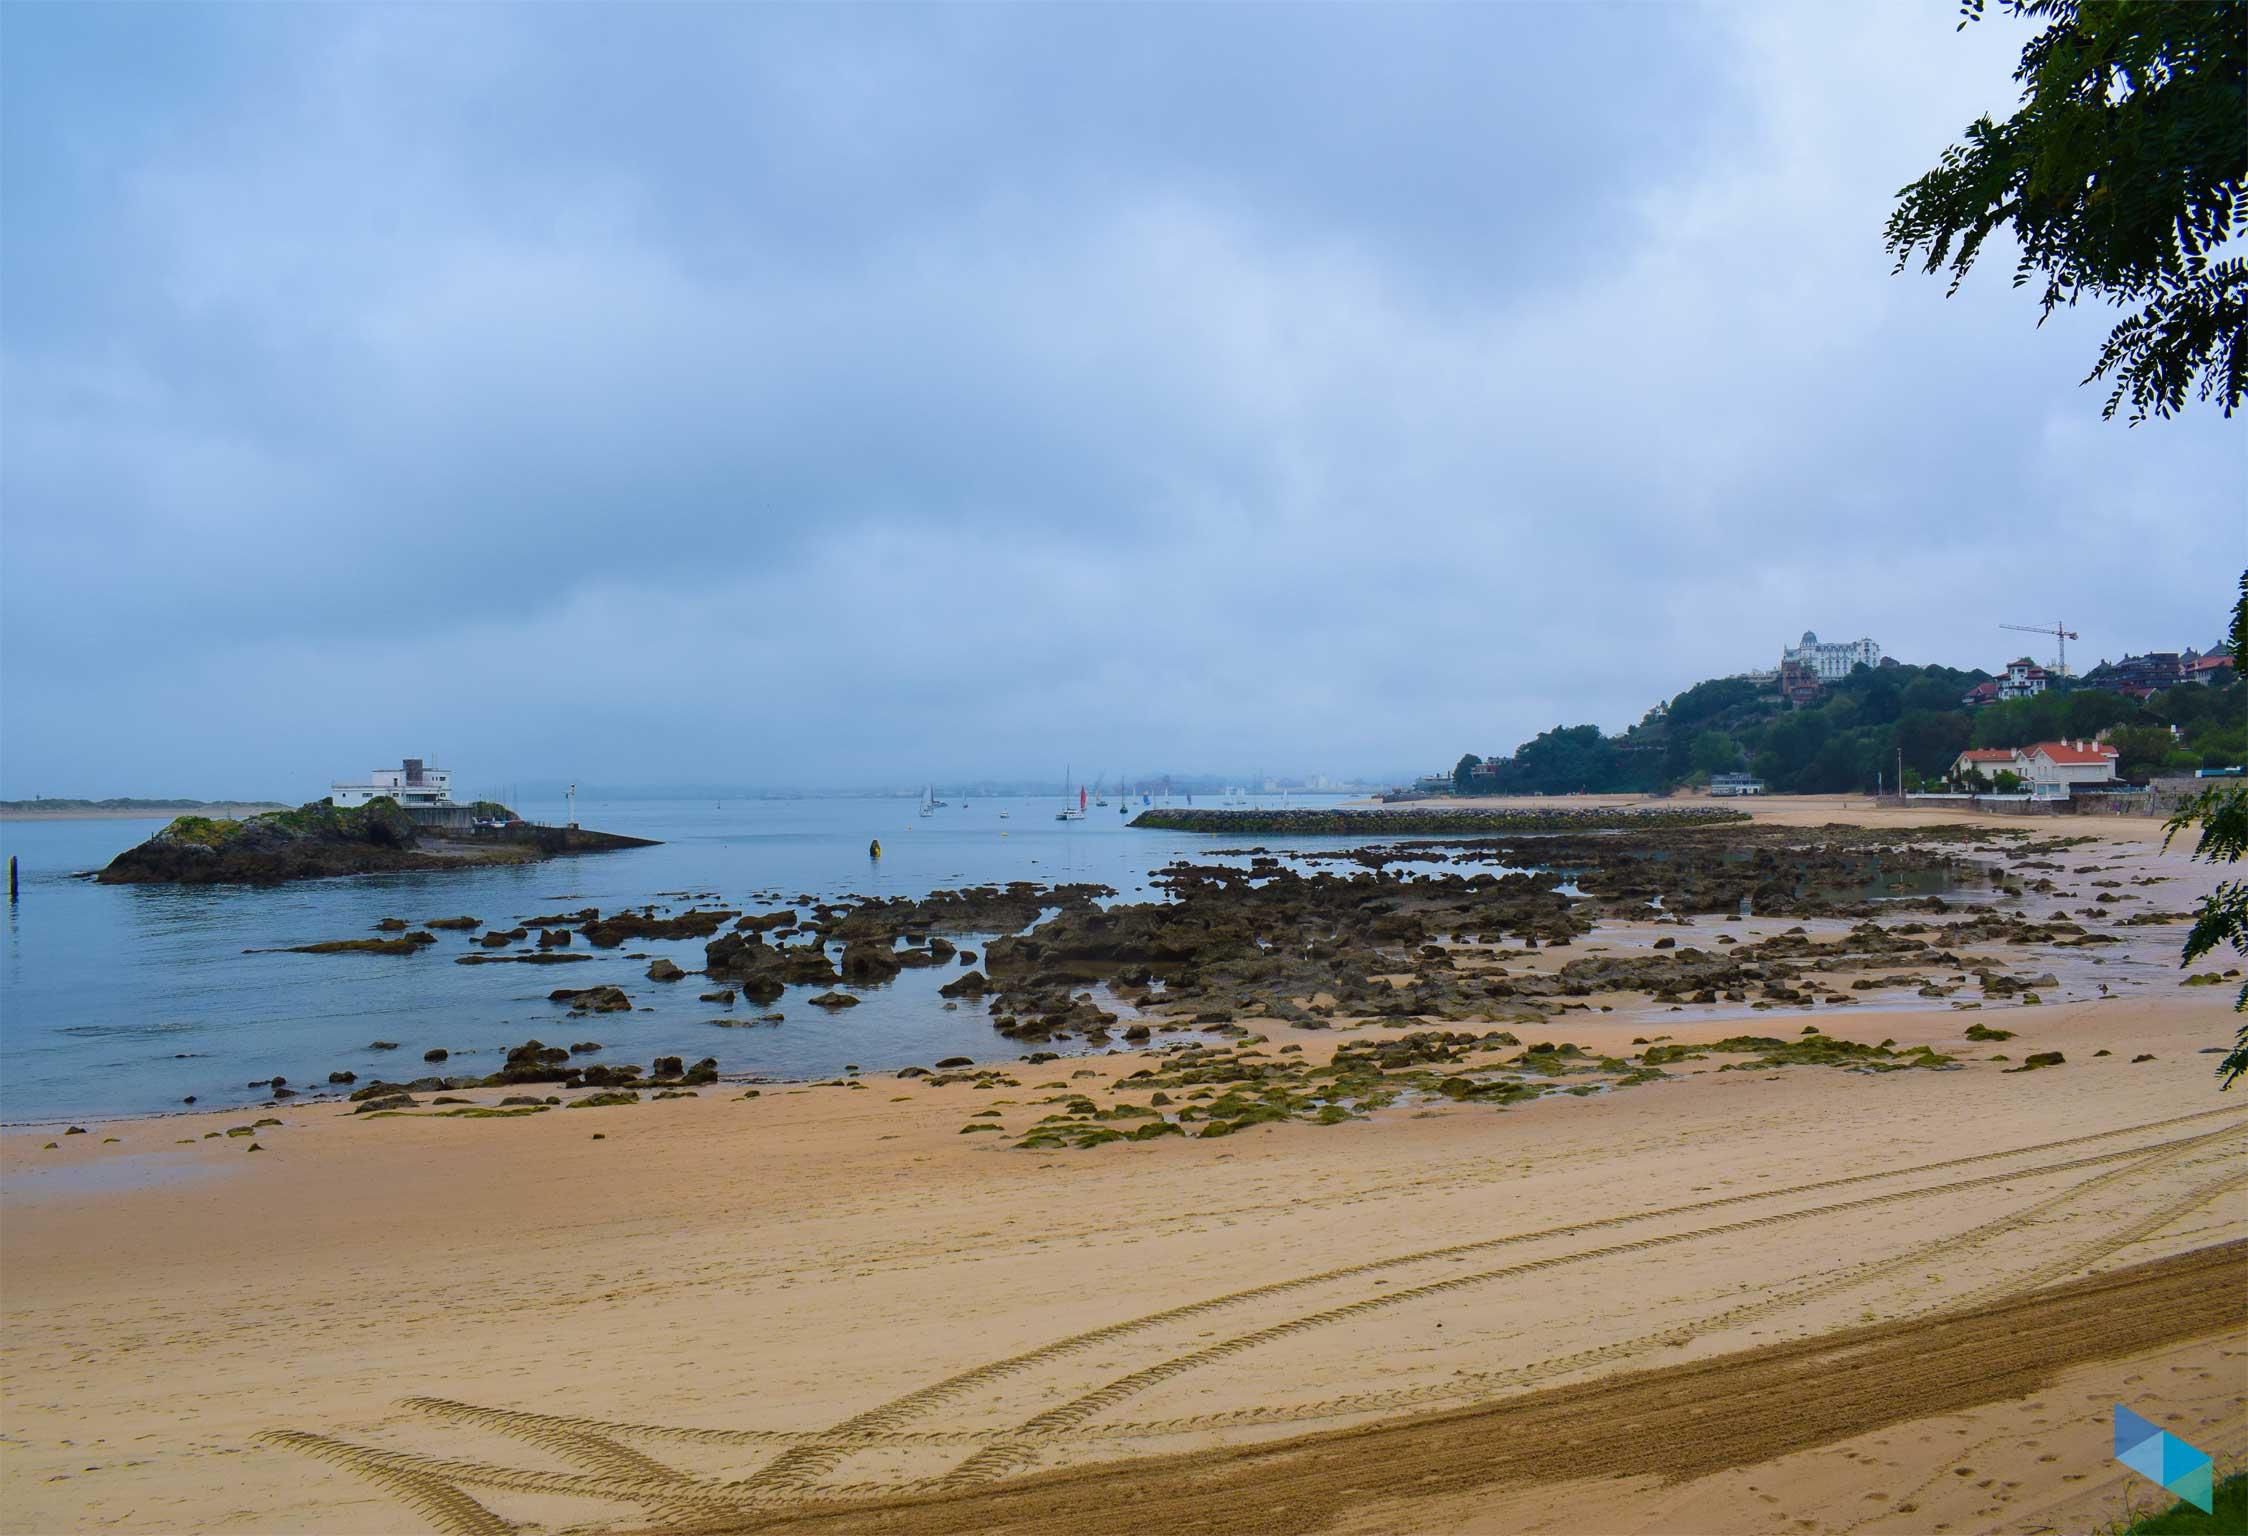 Playa de la Magdalena hacia el mar